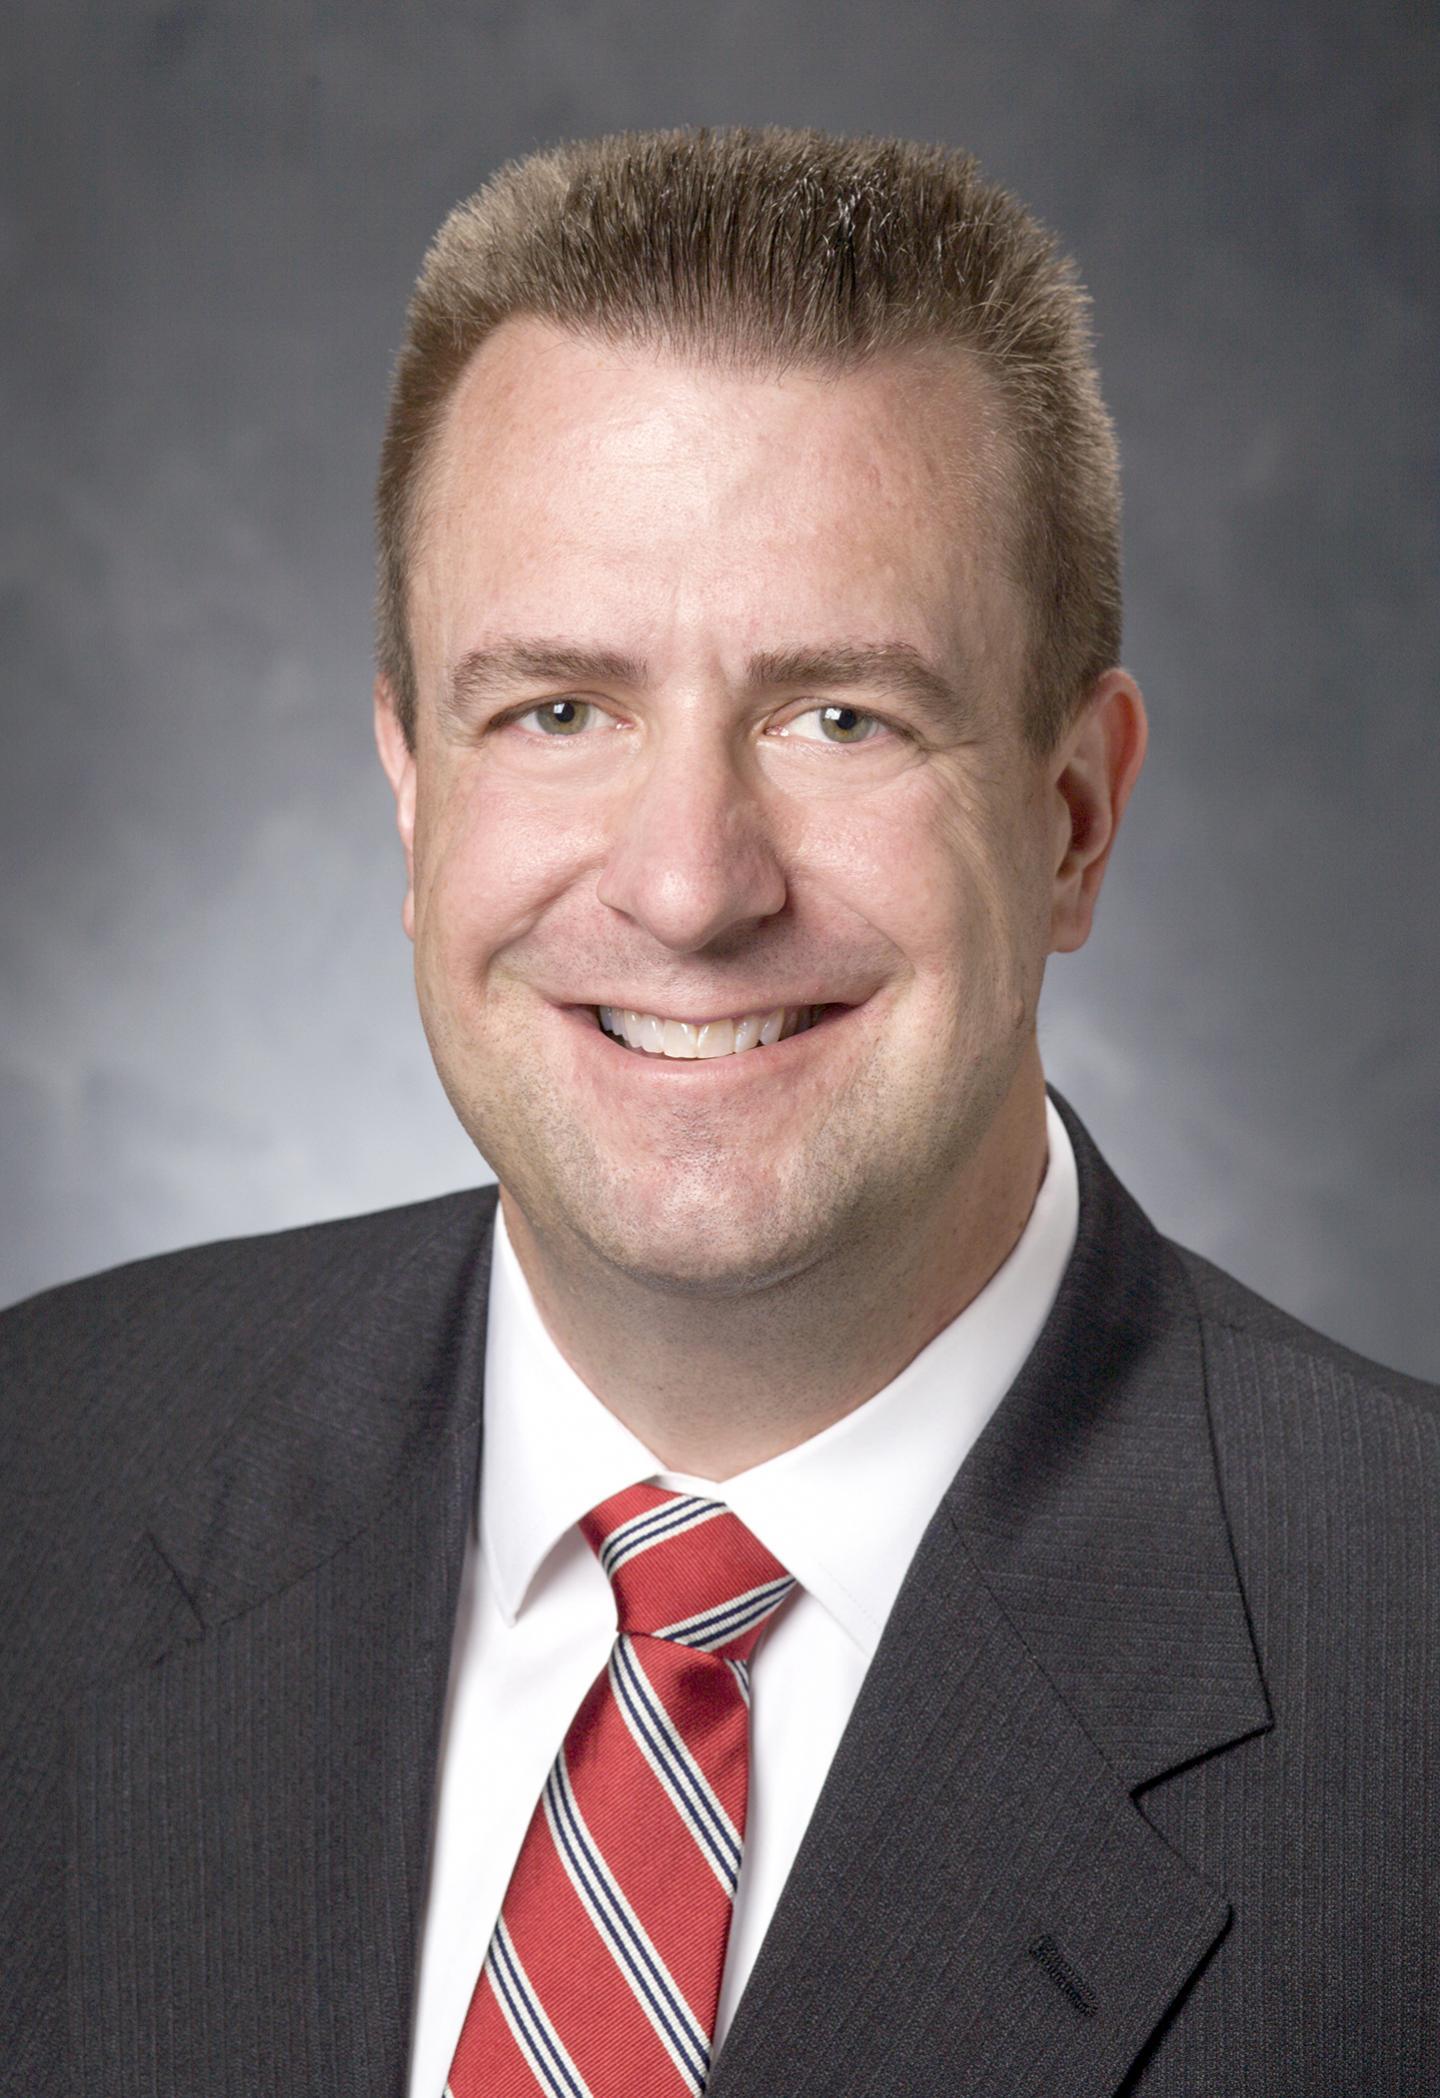 Tim Quigley, University of Georgia